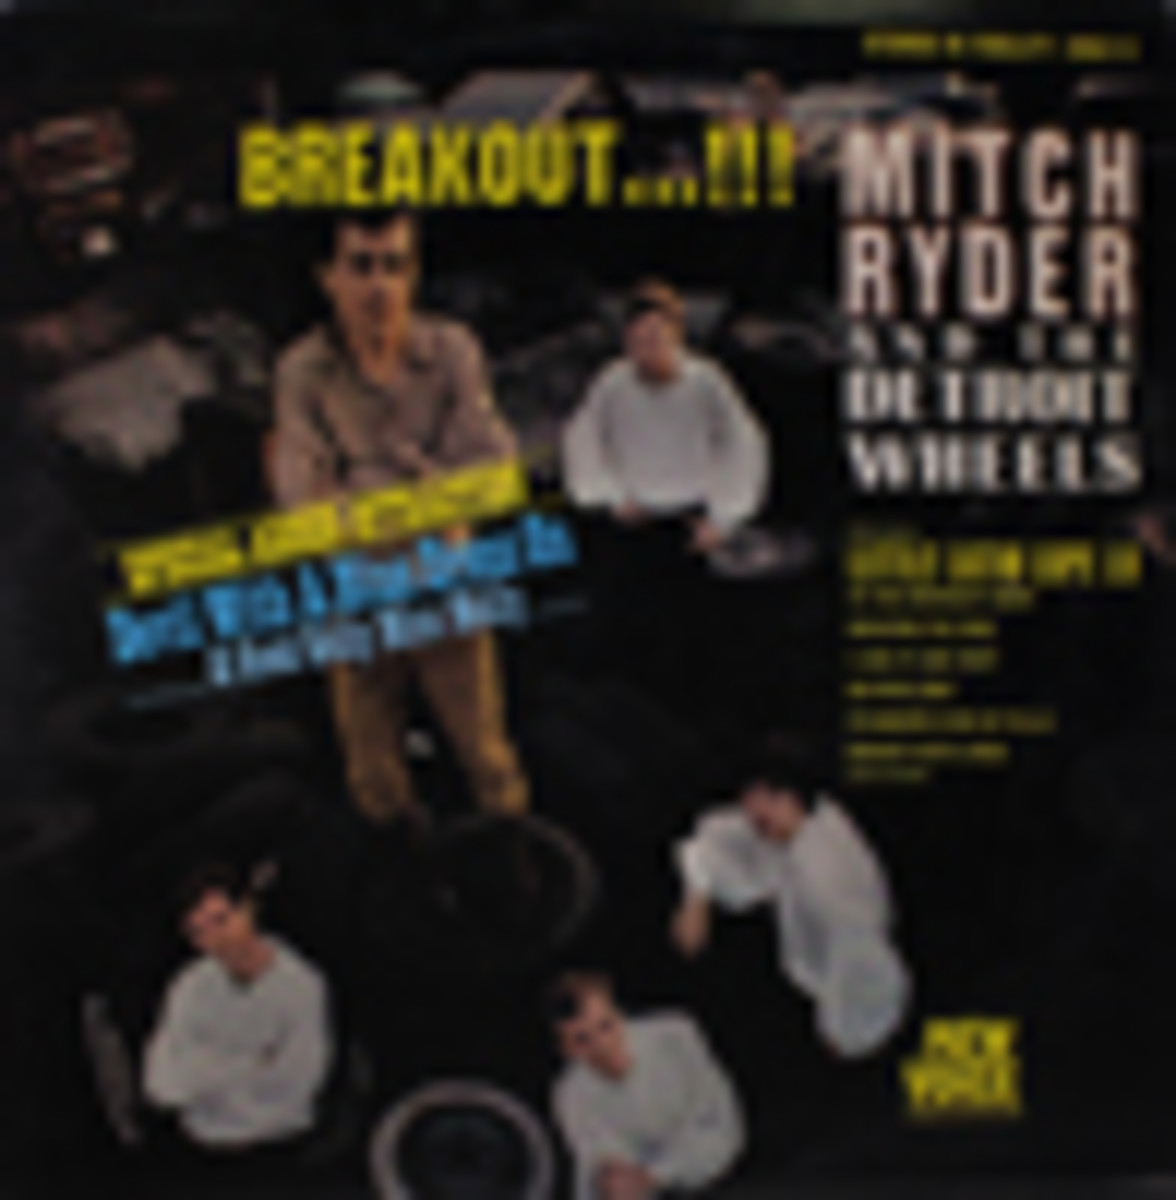 MitchRyderDetroitWheels_Breakout